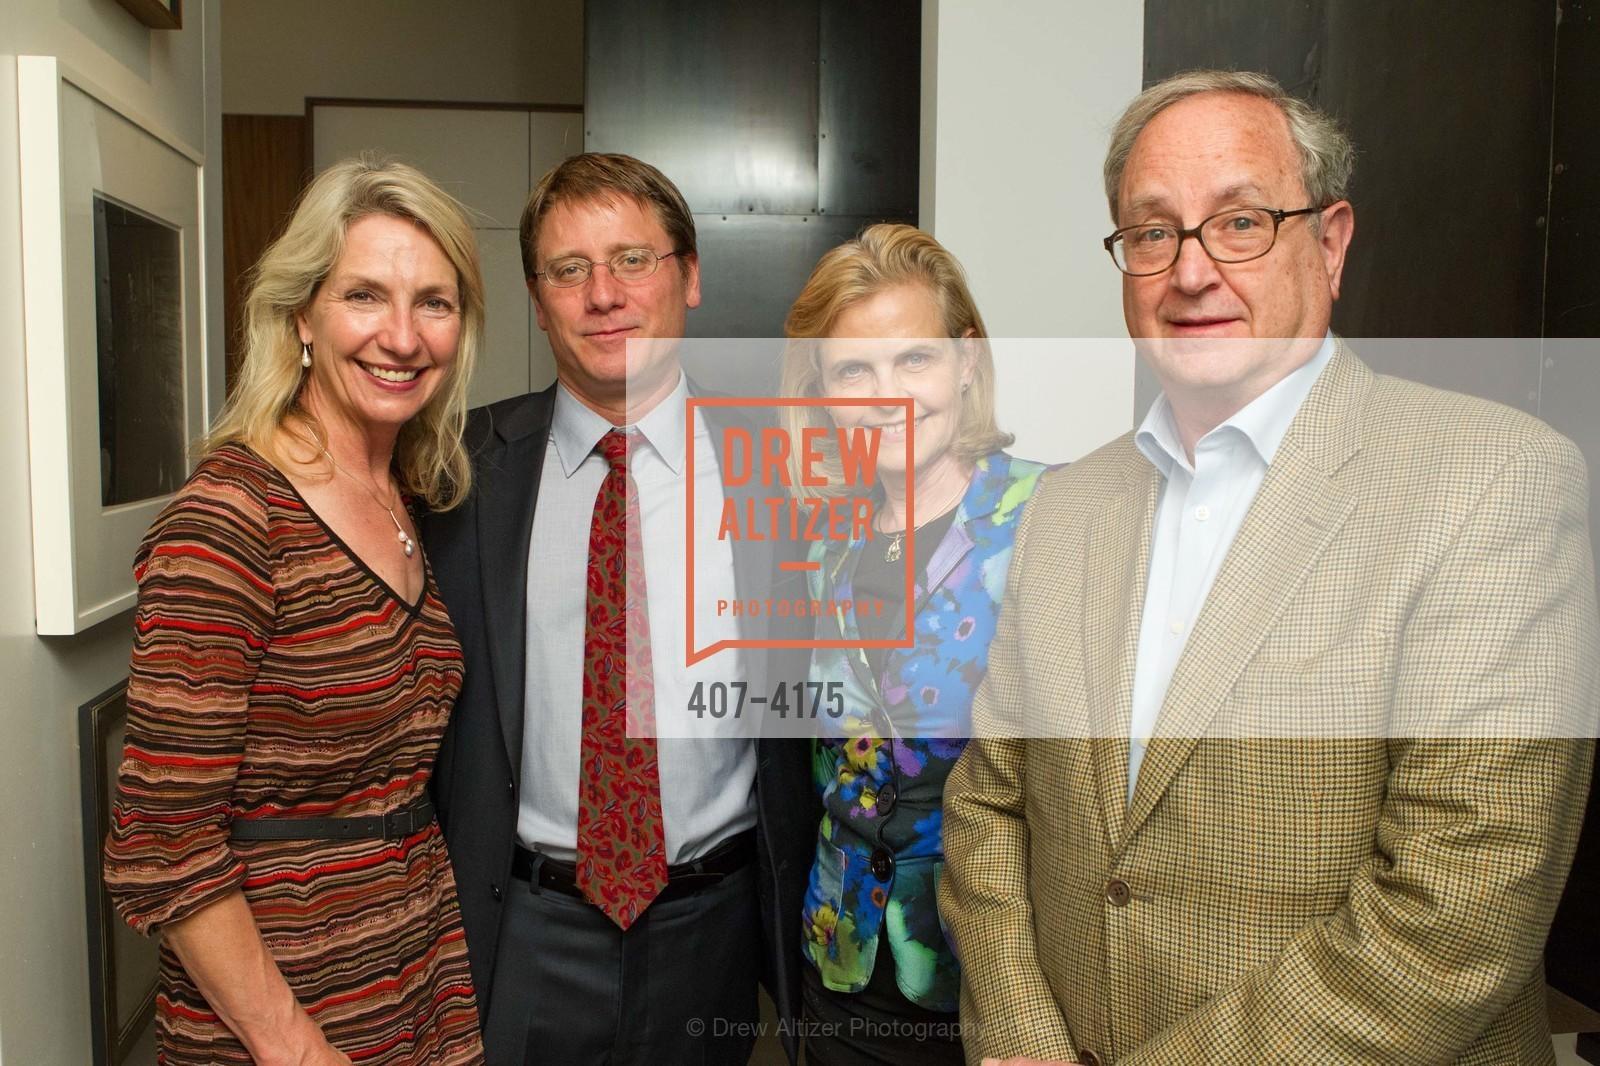 Kathy Geissler Best, Peter Crosby, Pauline Van Ysendoorn, Ron Bornstein, Photo #407-4175